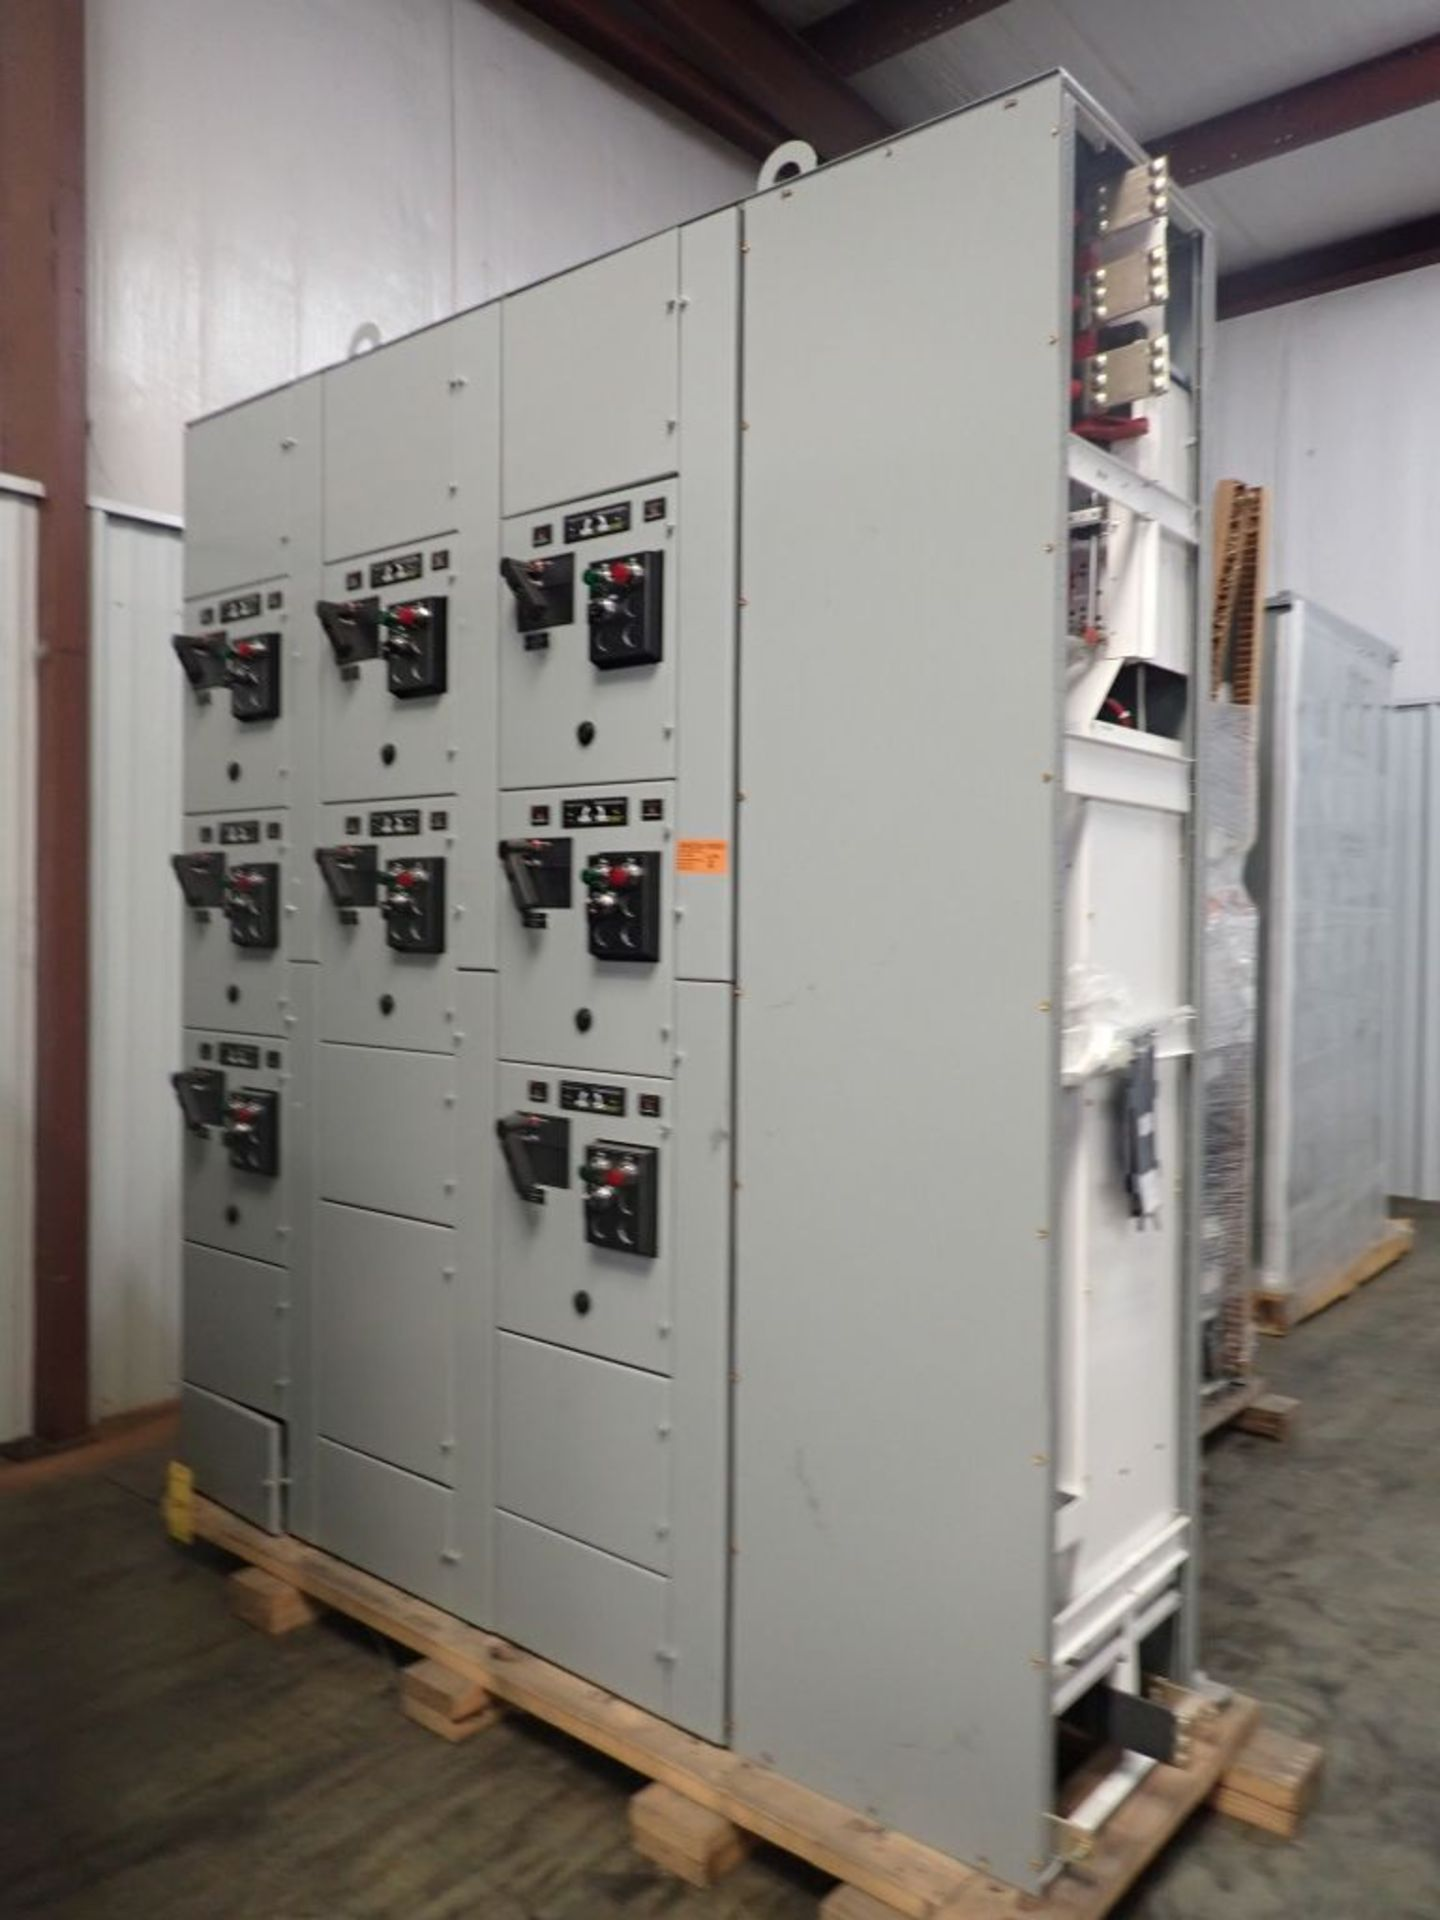 Eaton Freedom 2100 Series Motor Control Center | (11) F206-30A-10HP; (5) F206-15A-10HP; (1) SVX900-